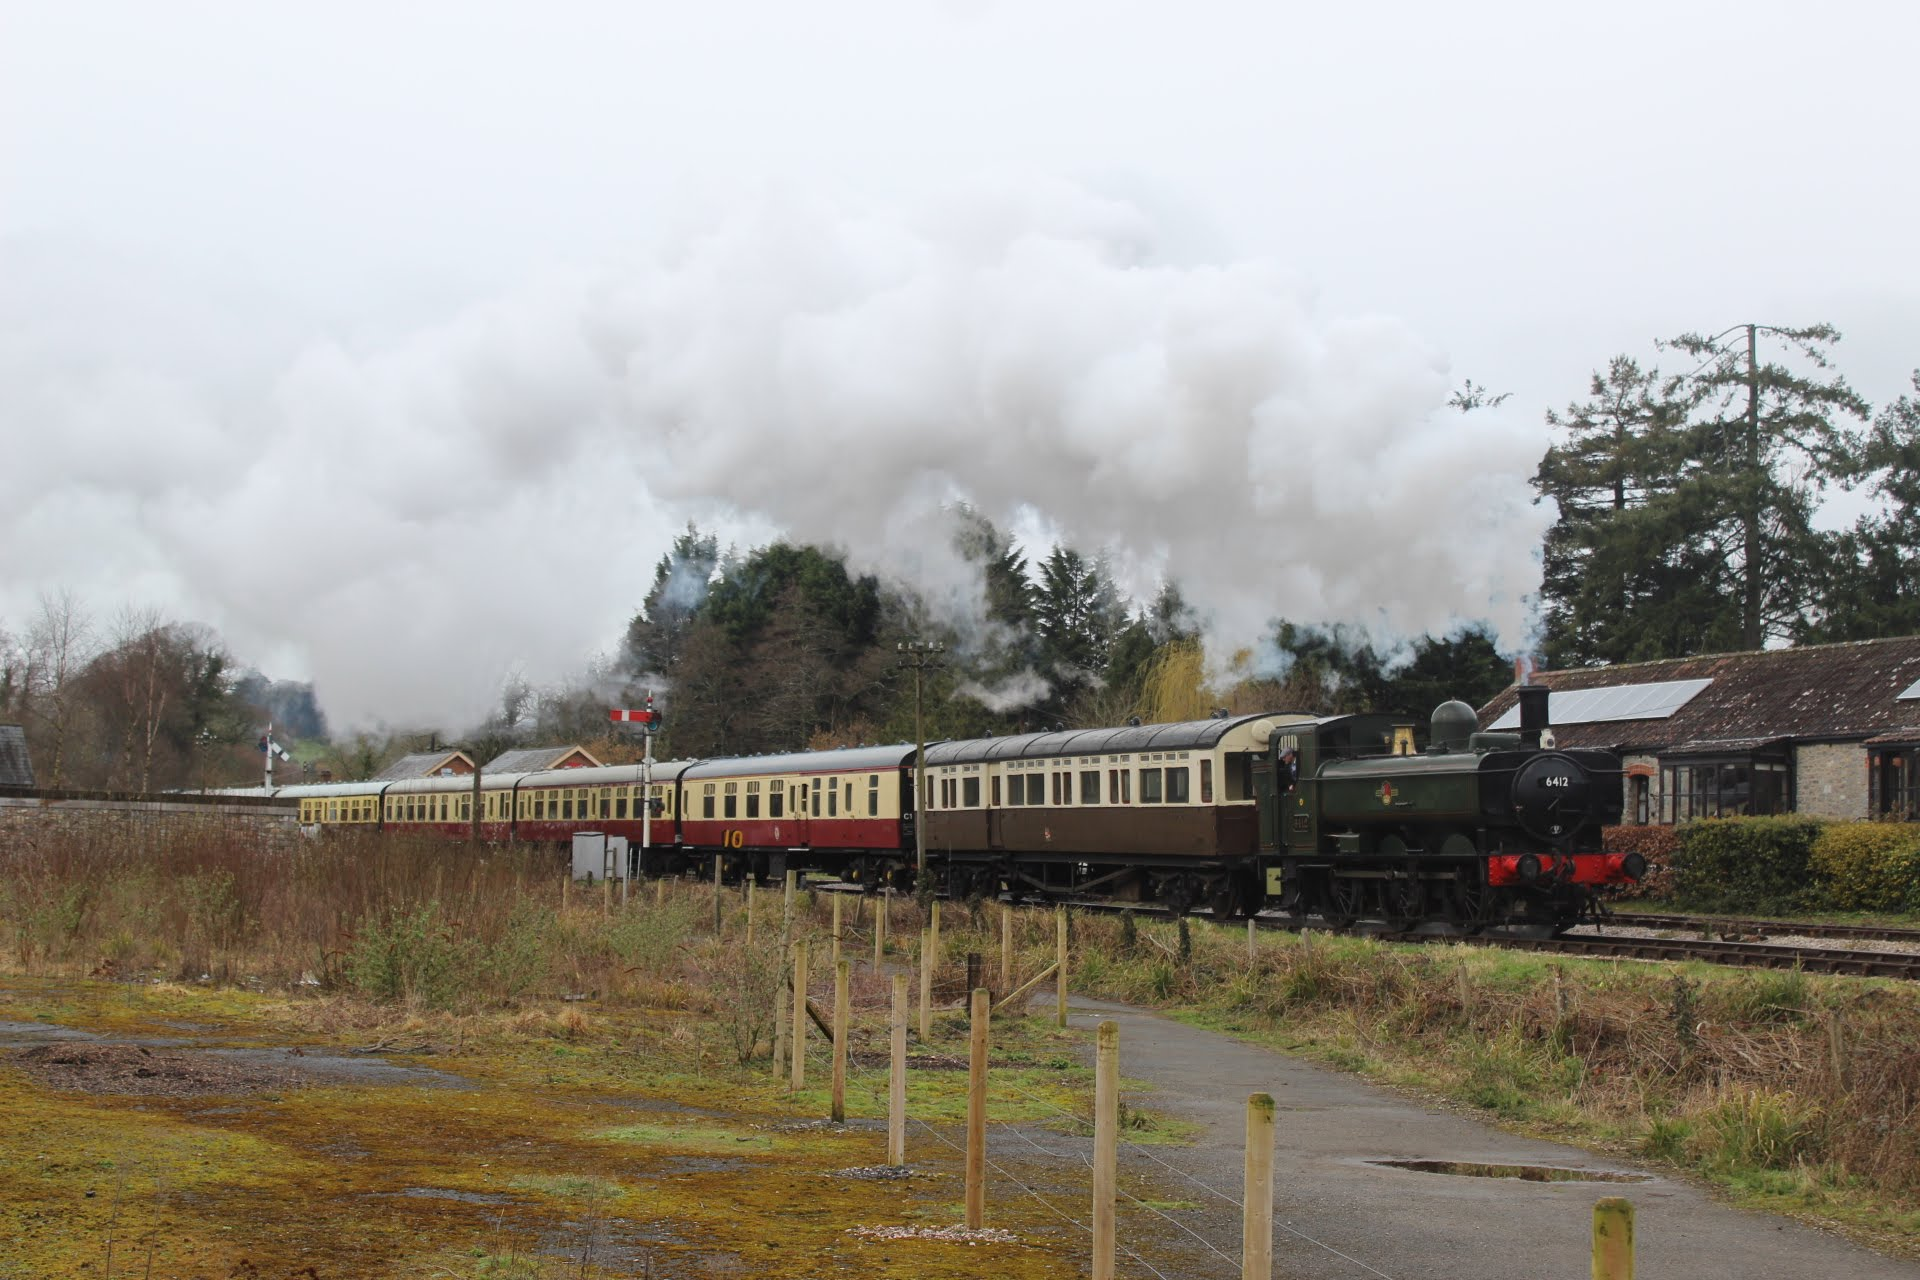 6412 on the South Devon Railway